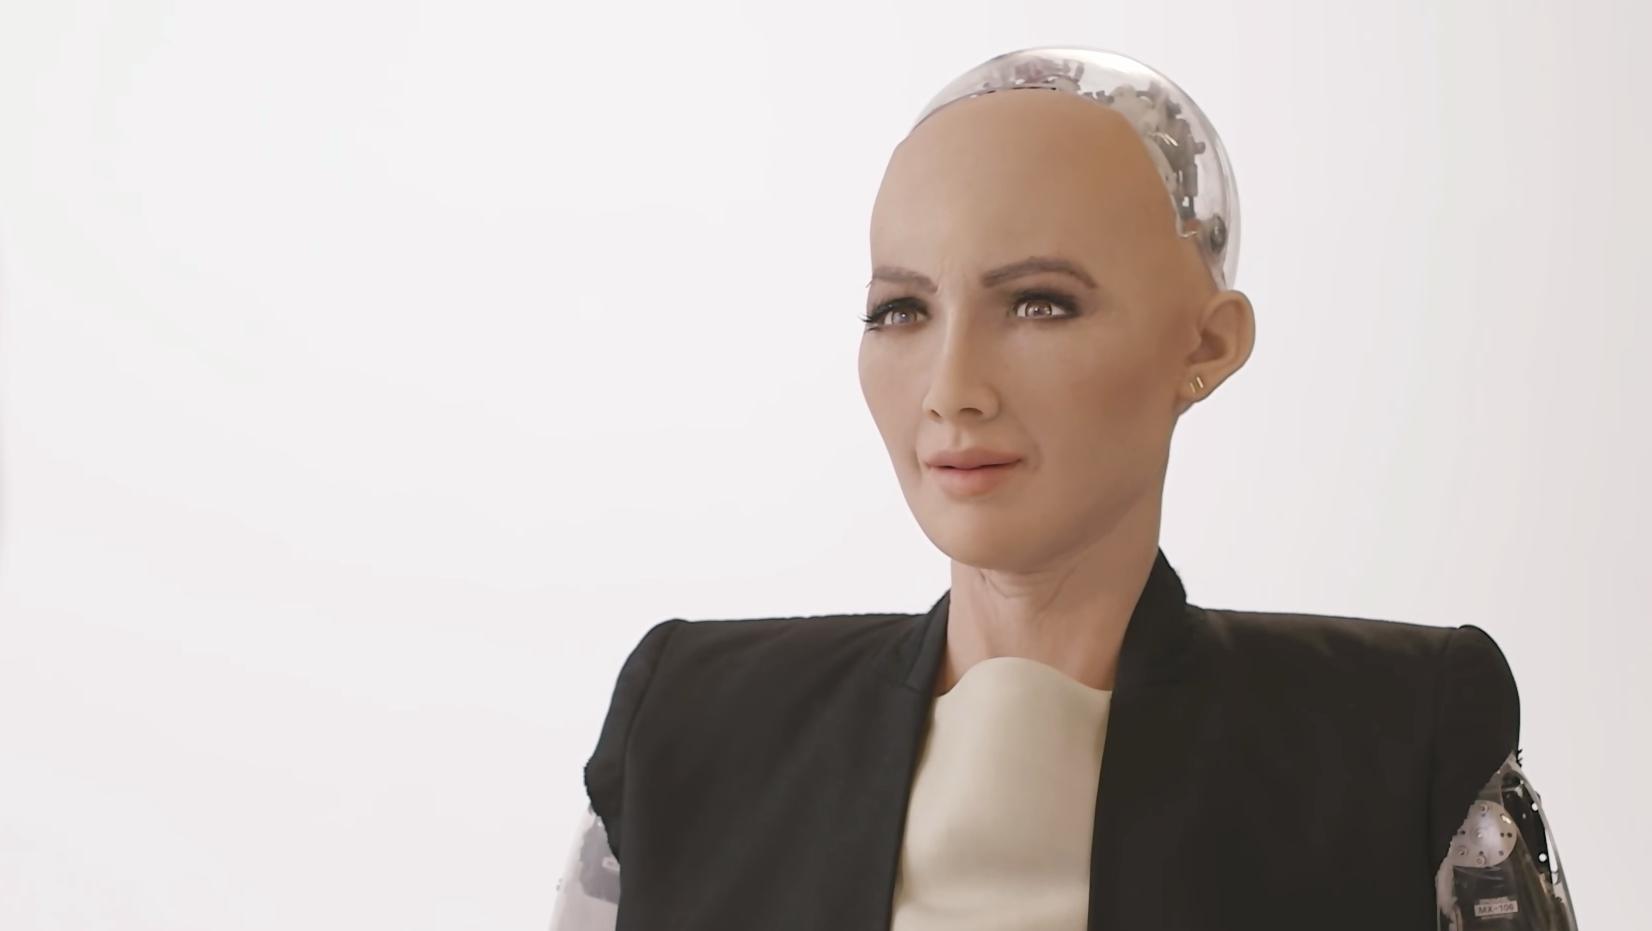 Saudi Arabia's Robot Love Is Getting Weird